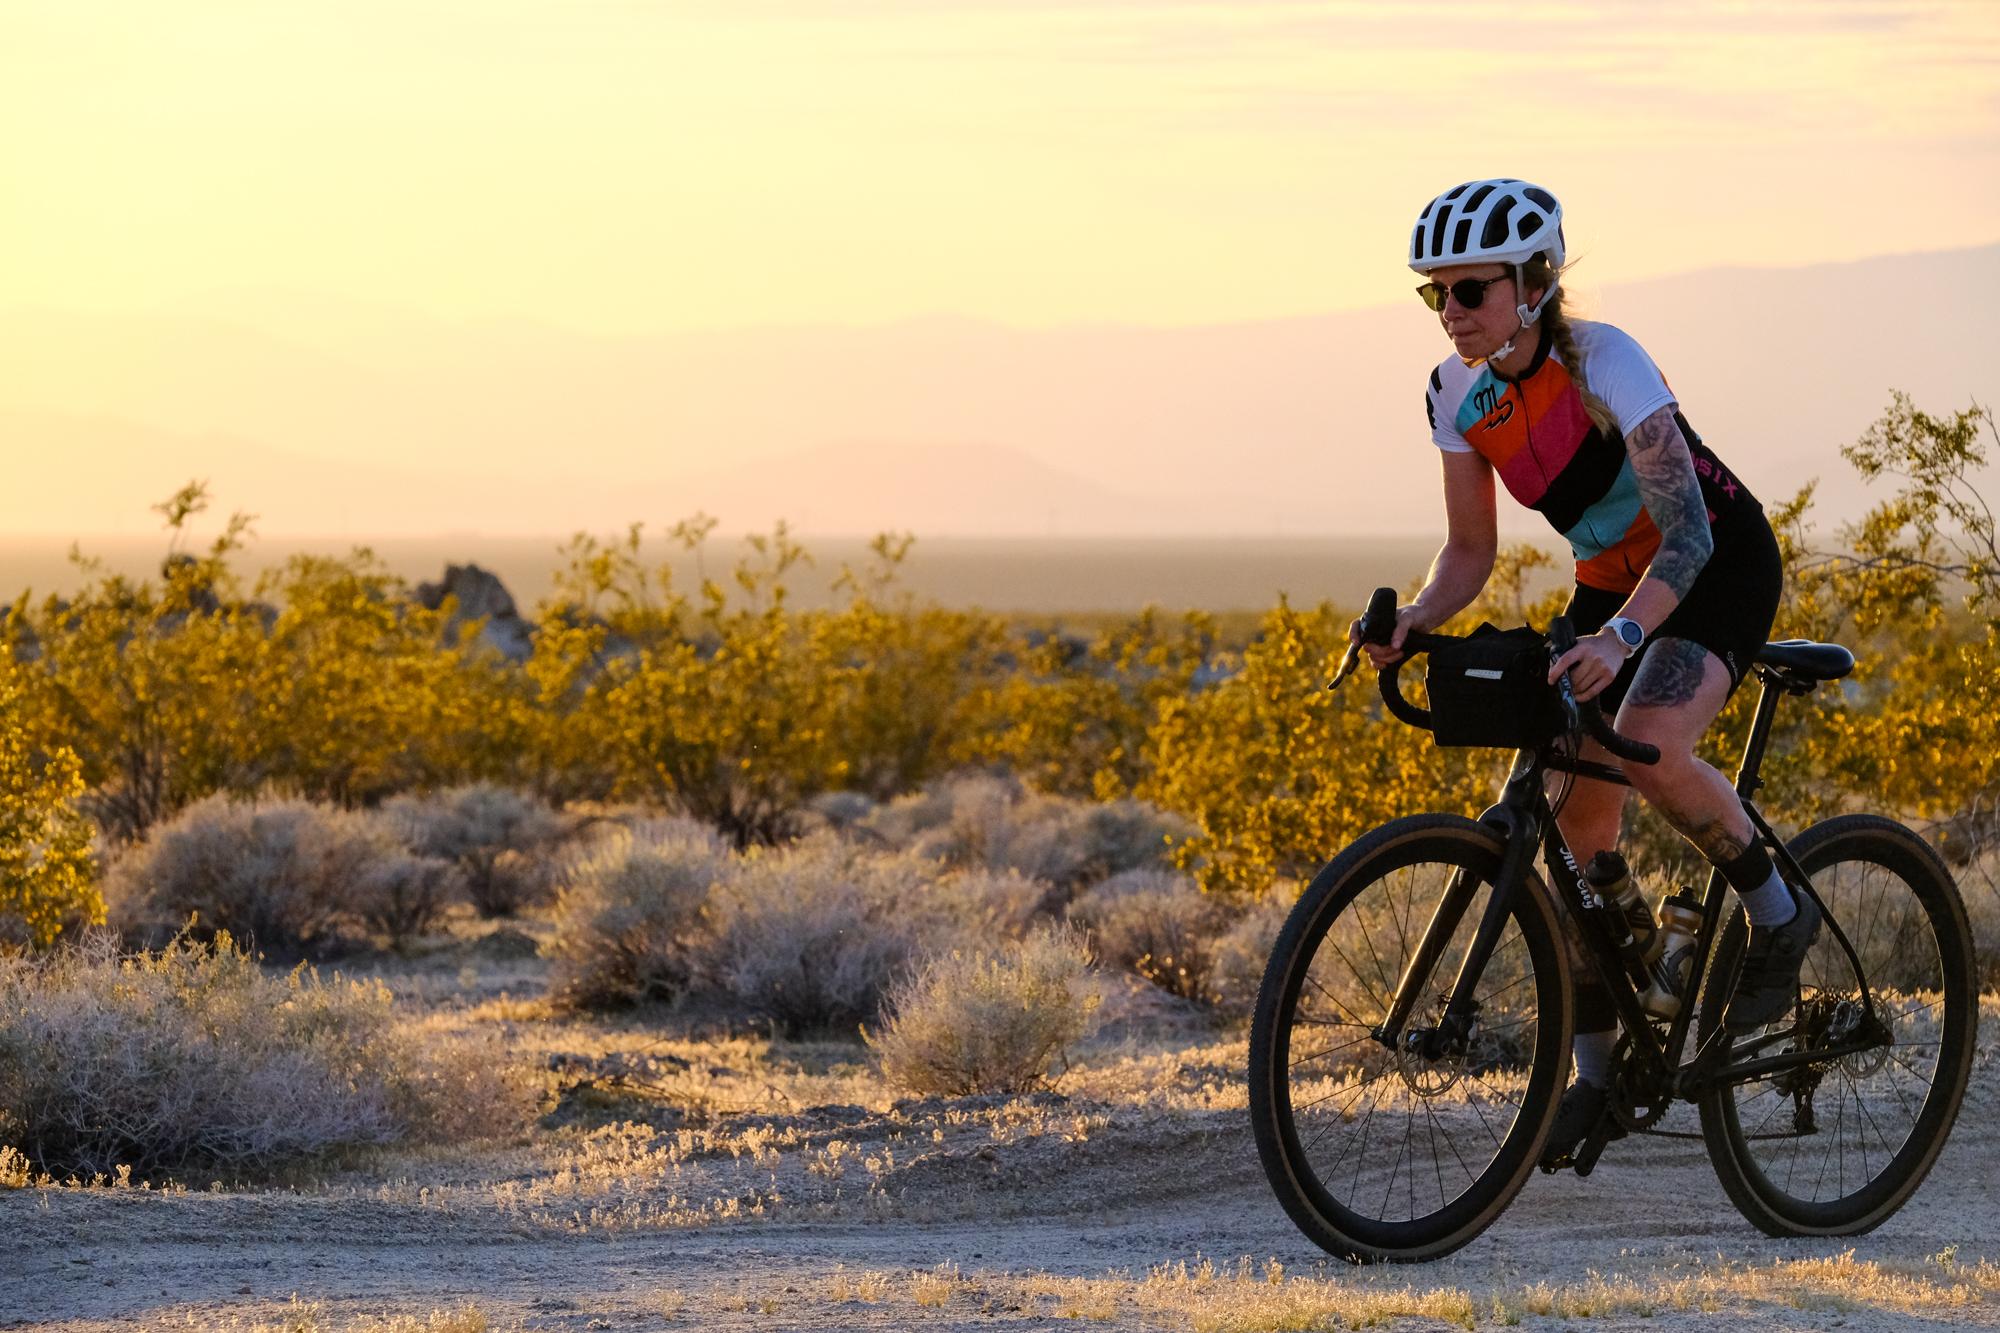 Mojave-15.jpg